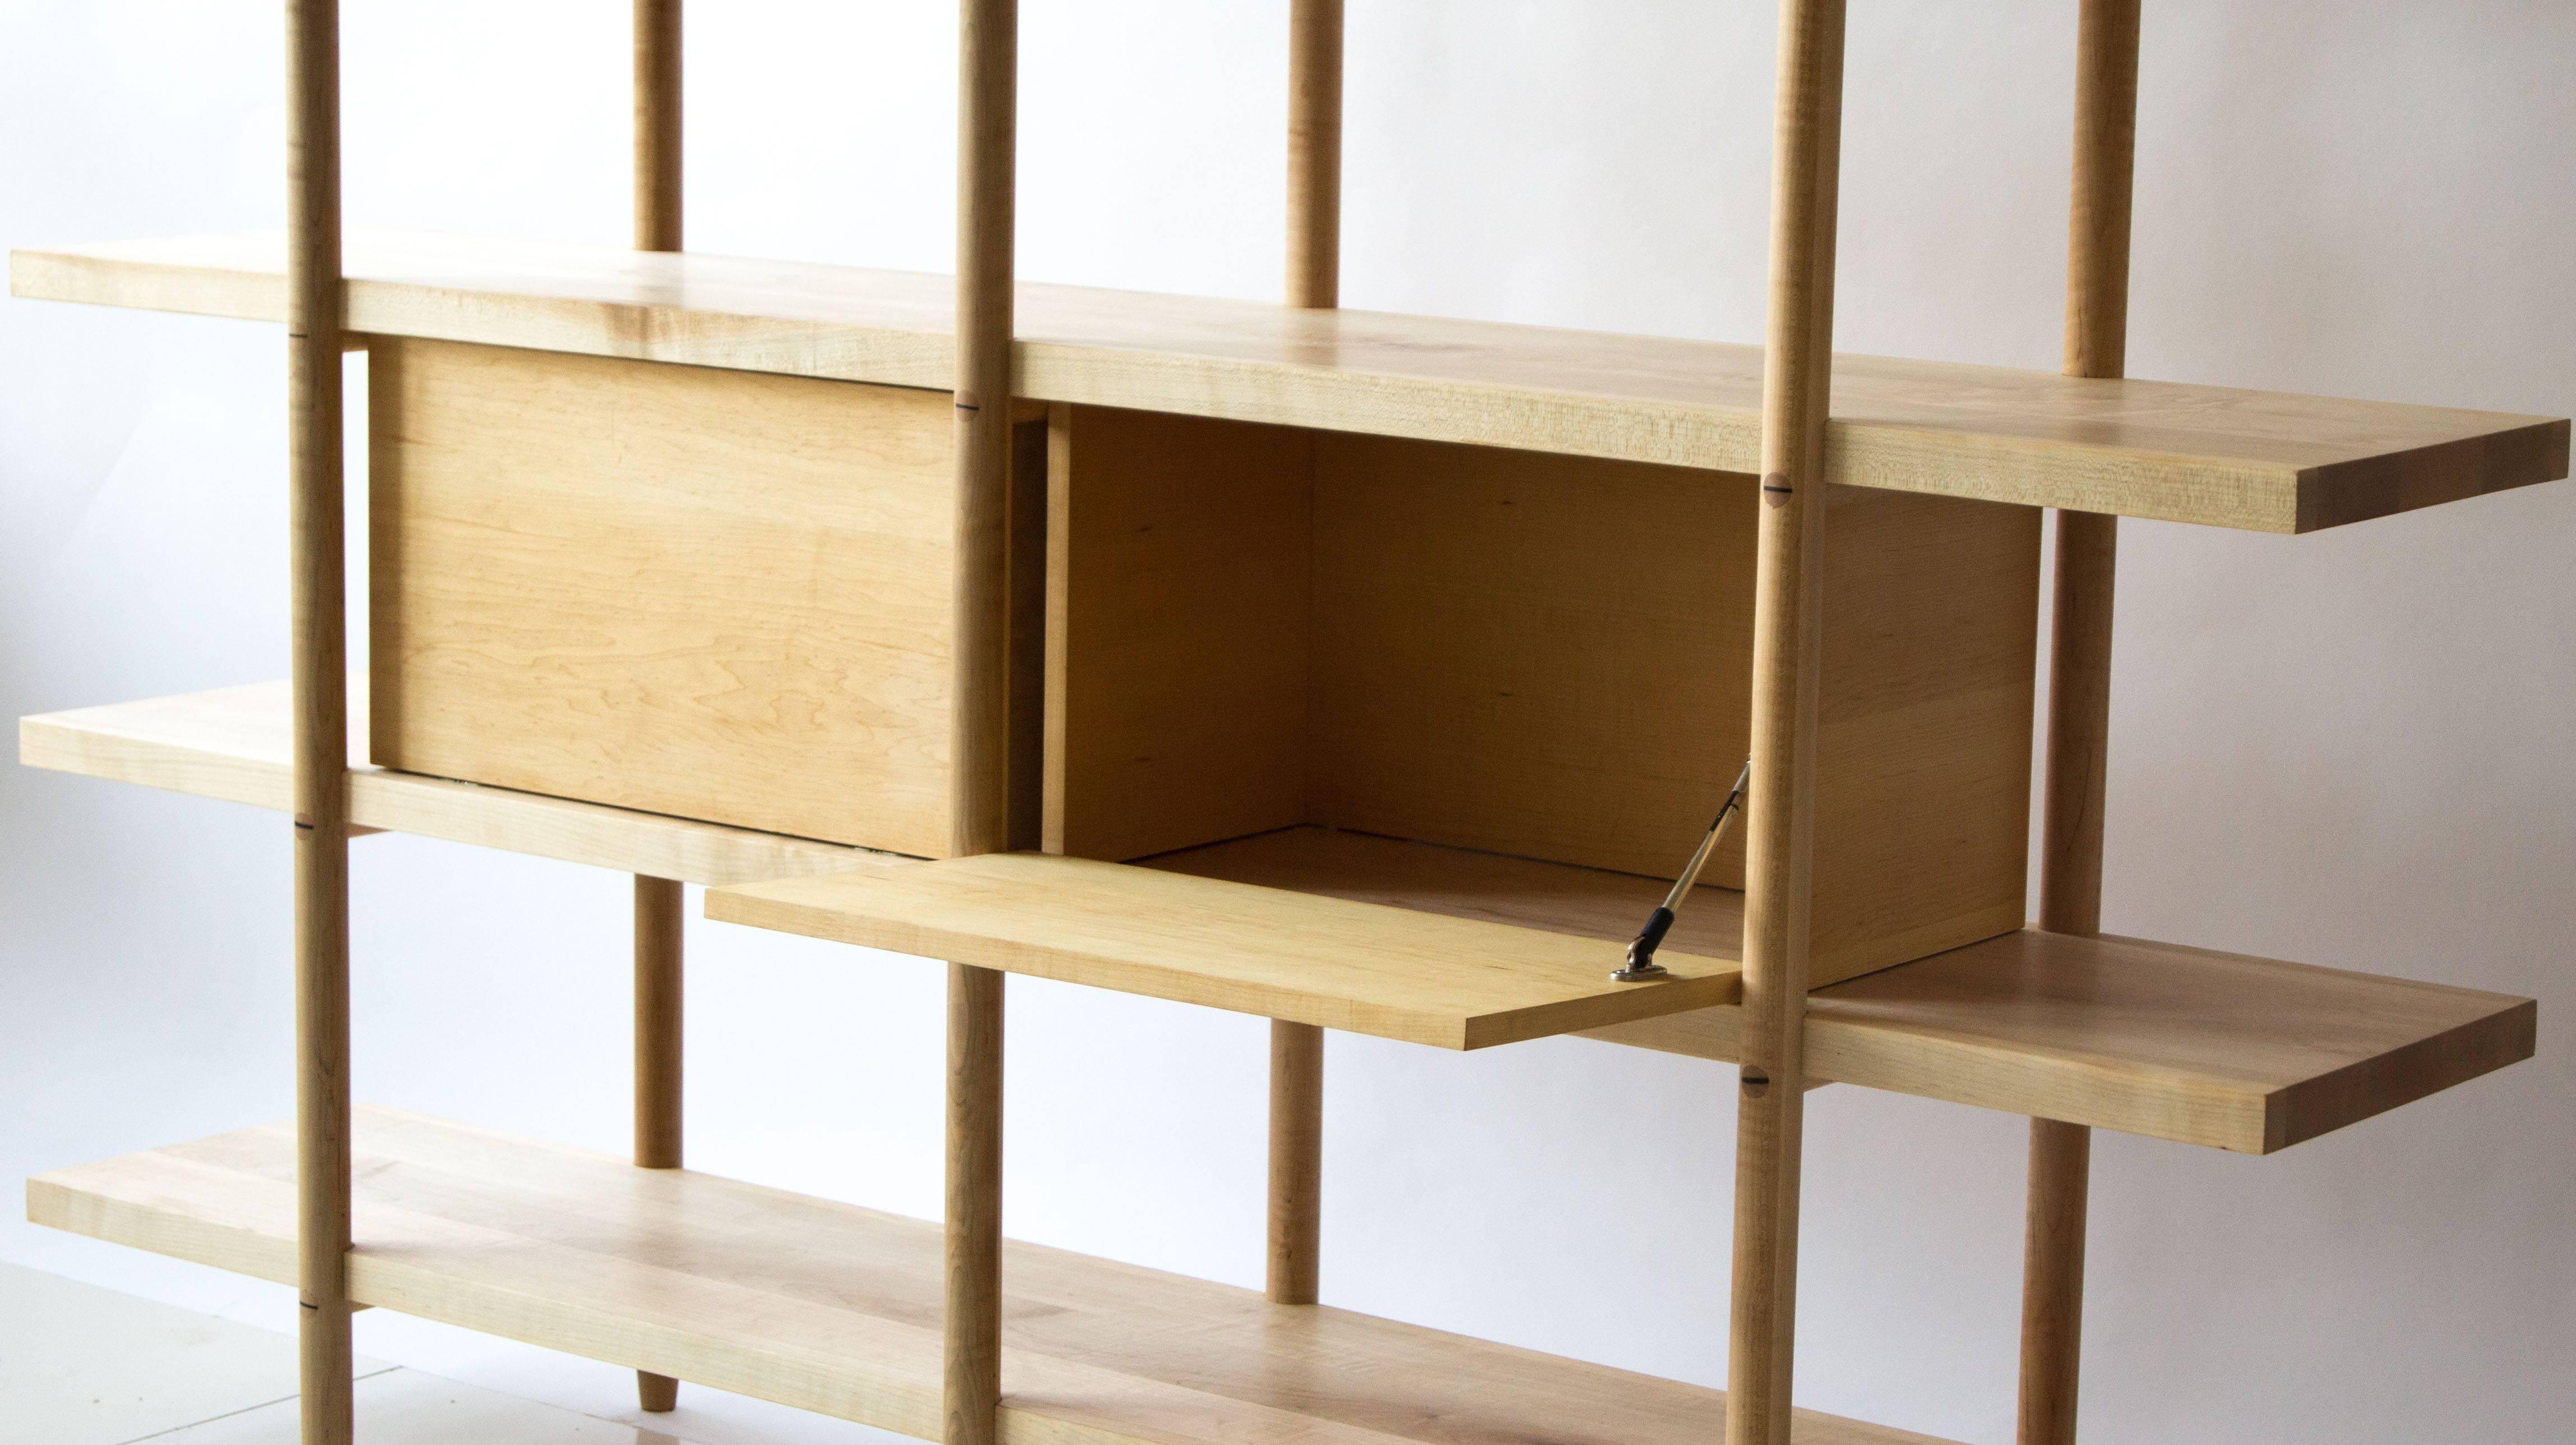 Deepstep Shelving  Maple And Ebony Modular Storage With Fine